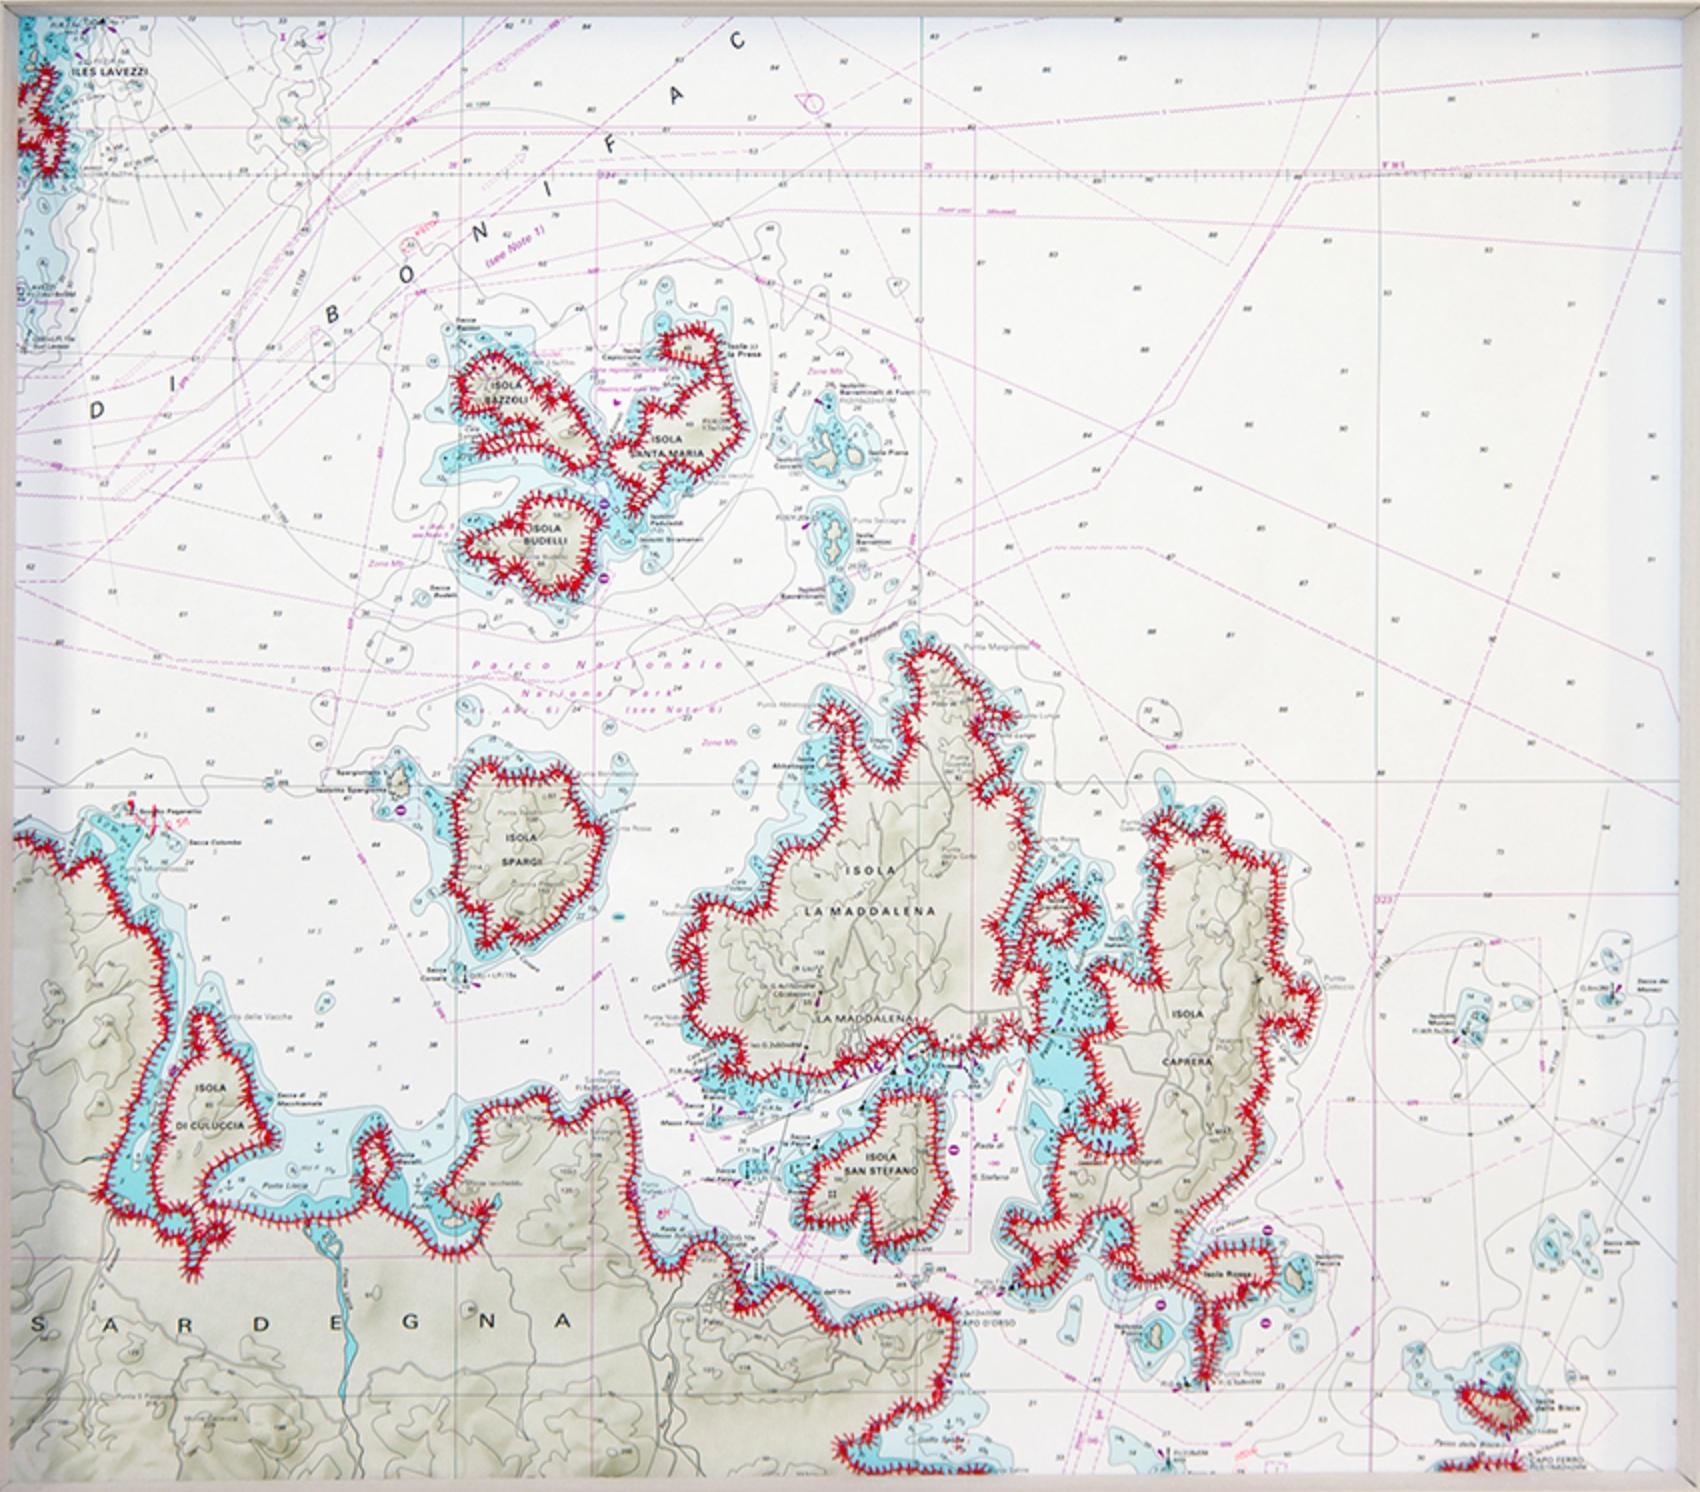 La Maddalena Archipelago